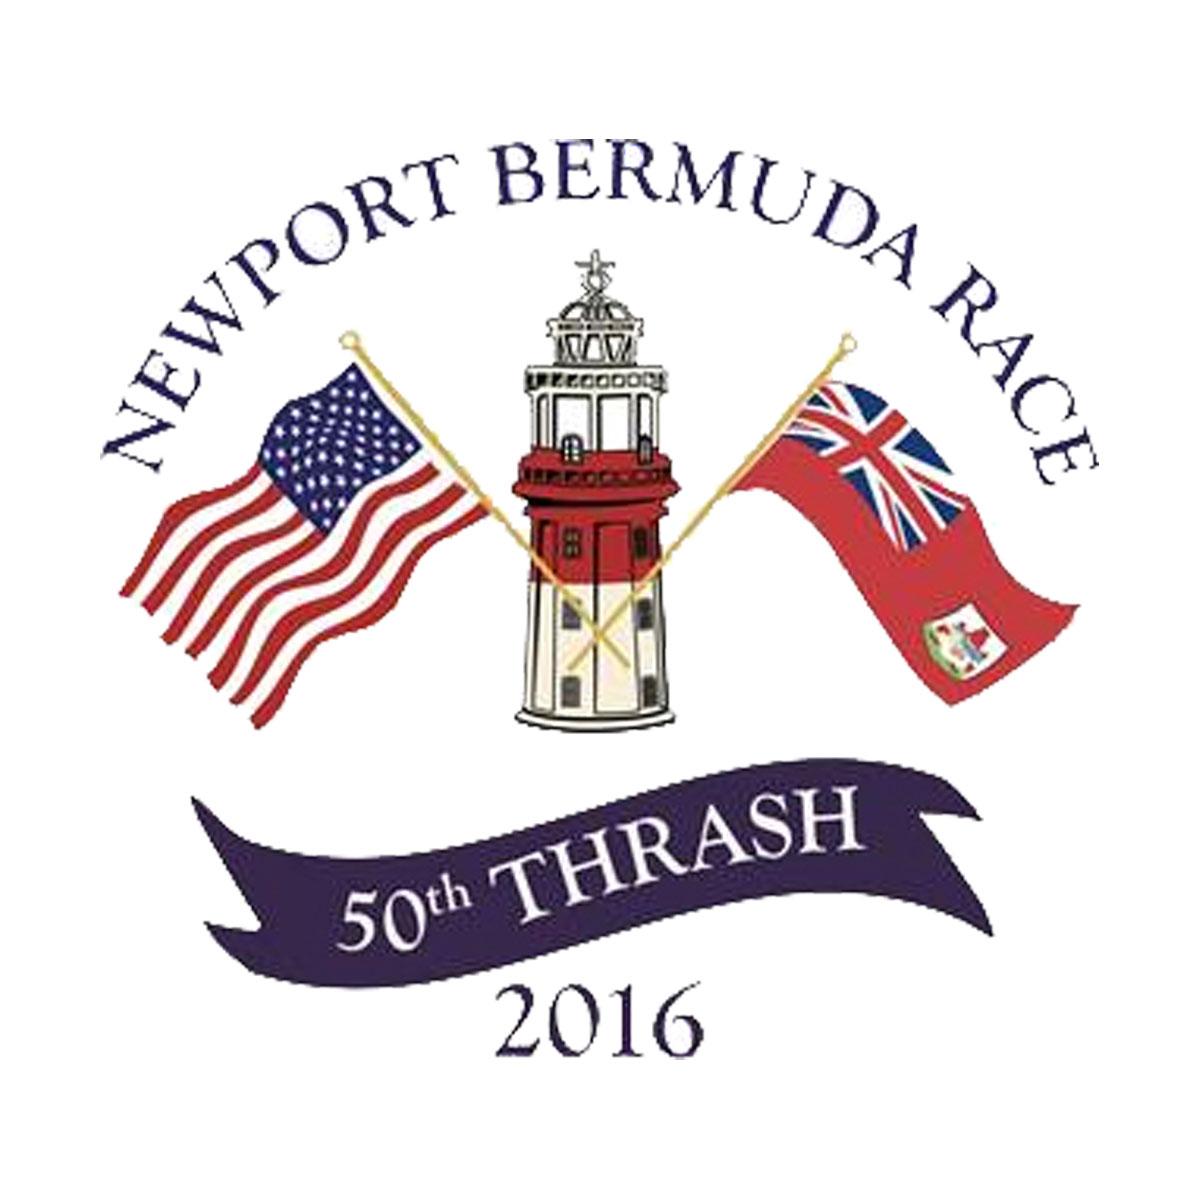 2016 NEWPORT BERMUDA RACE LOGO